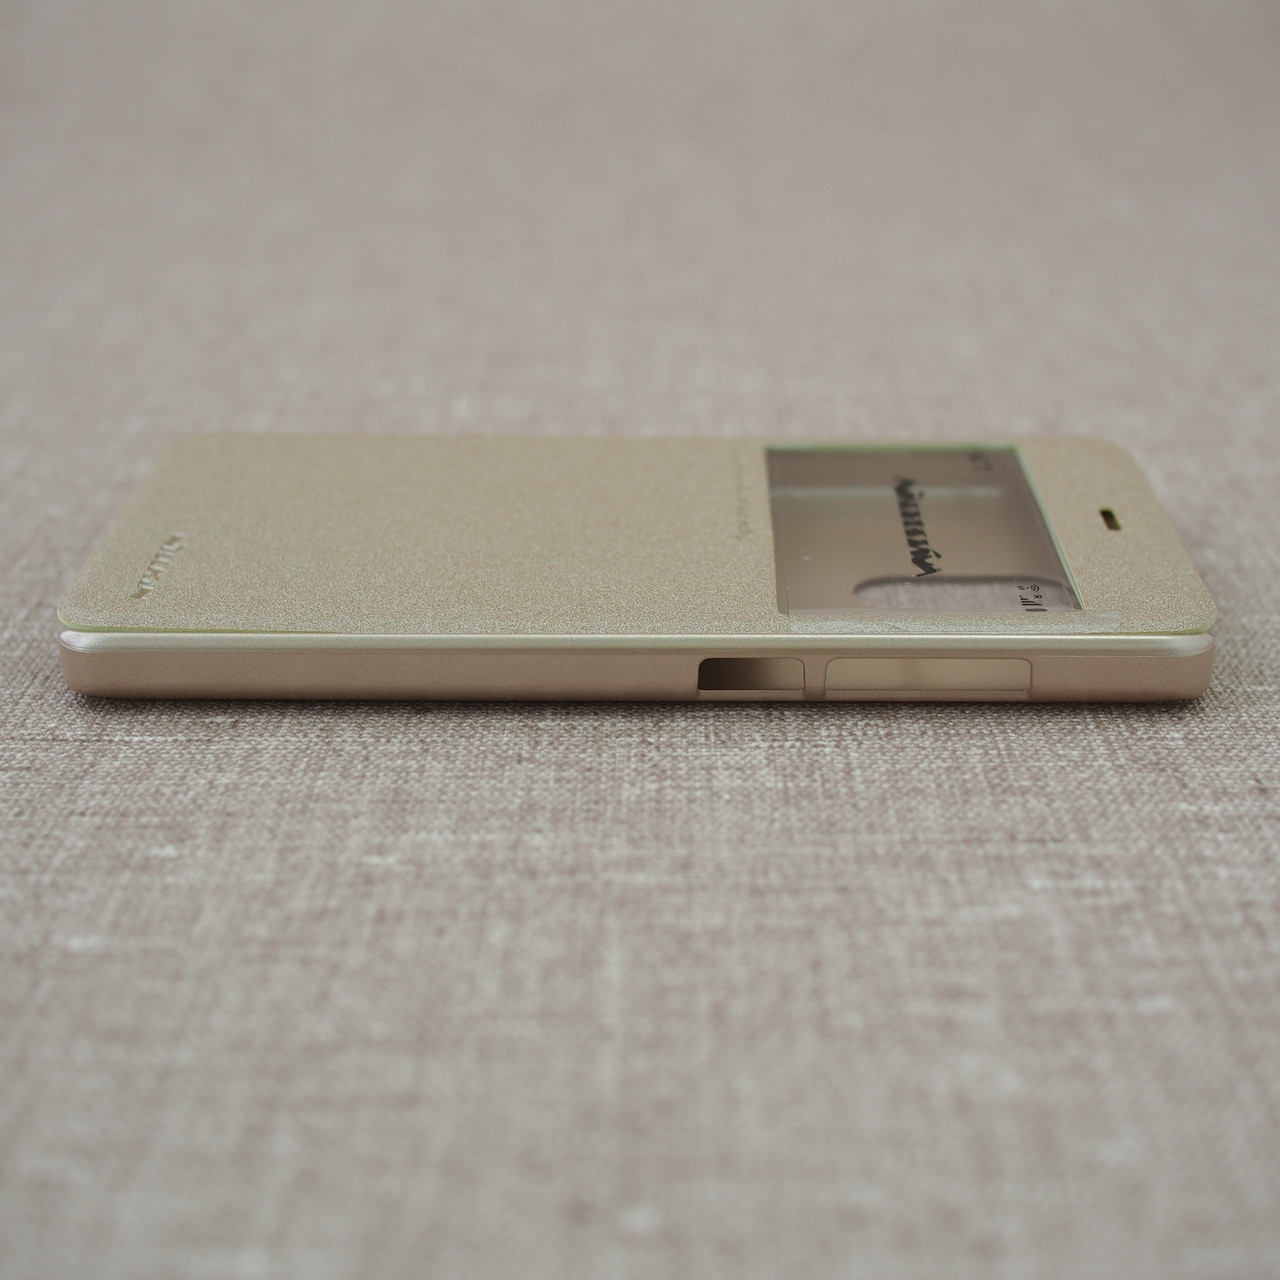 Чехлы для Xiaomi Redmi 4 Pro / Prime Nillkin Sparkle gold